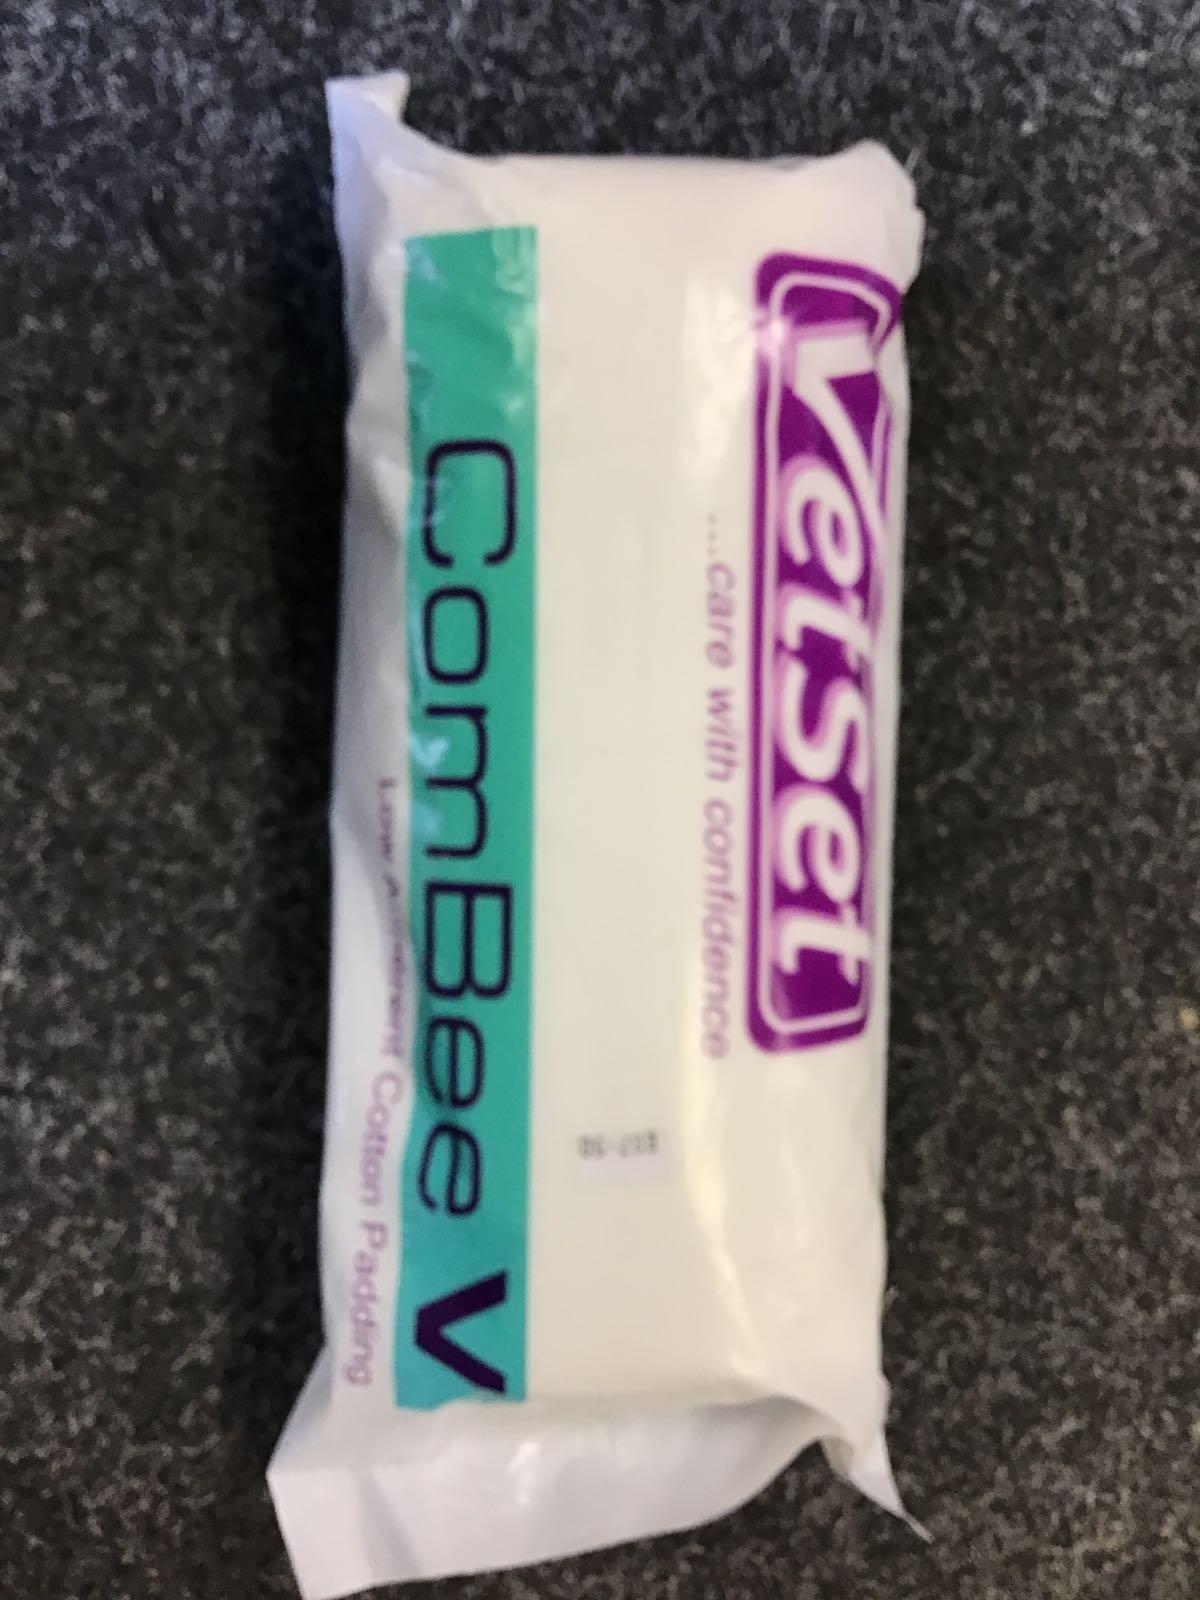 VetSet ComBeeV cotton padding